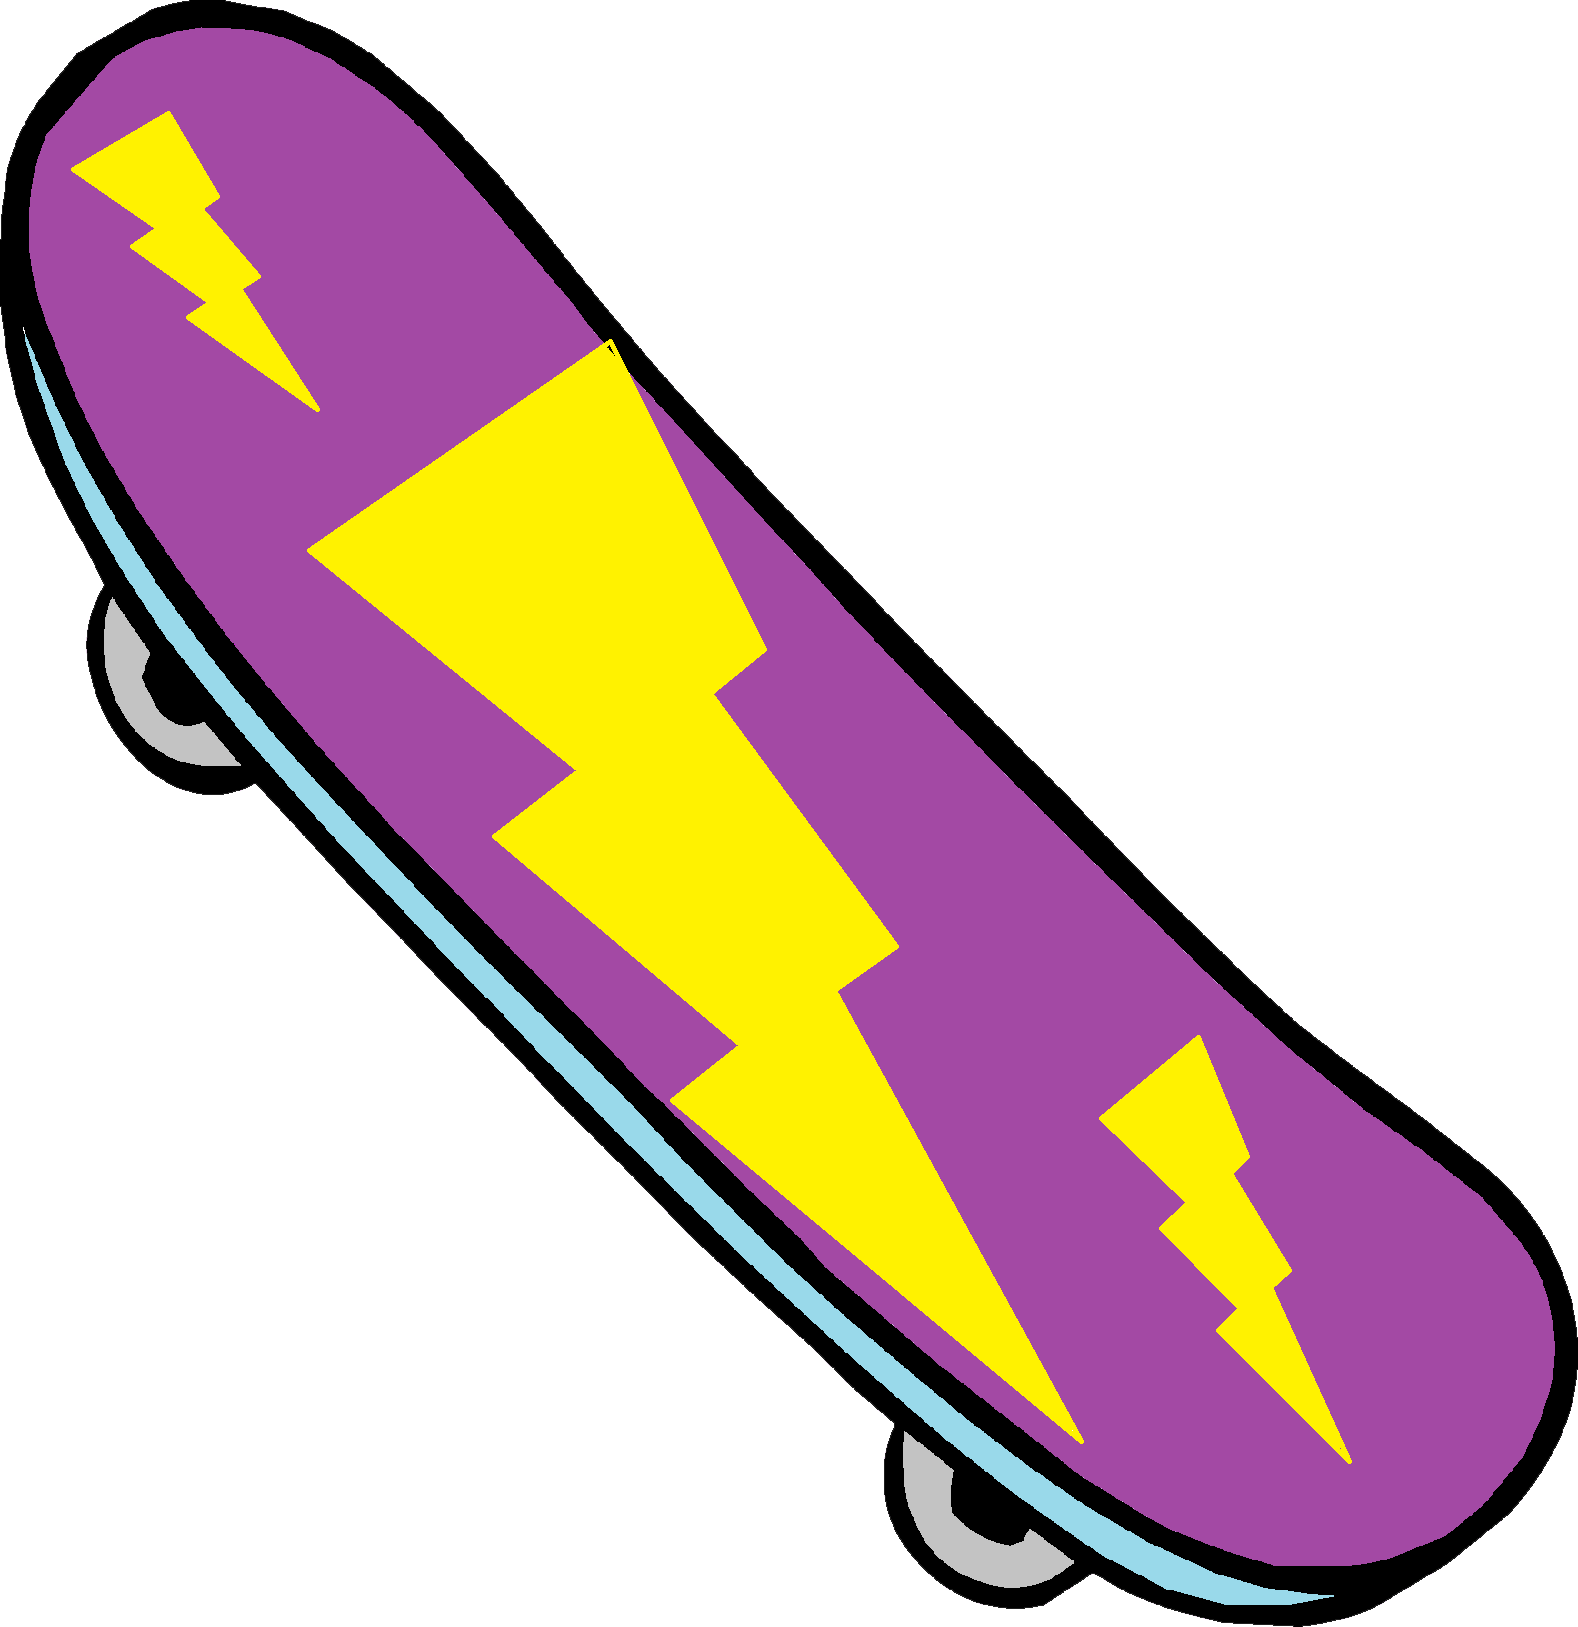 1578x1627 Skateboarding Clipart Skateboard Image